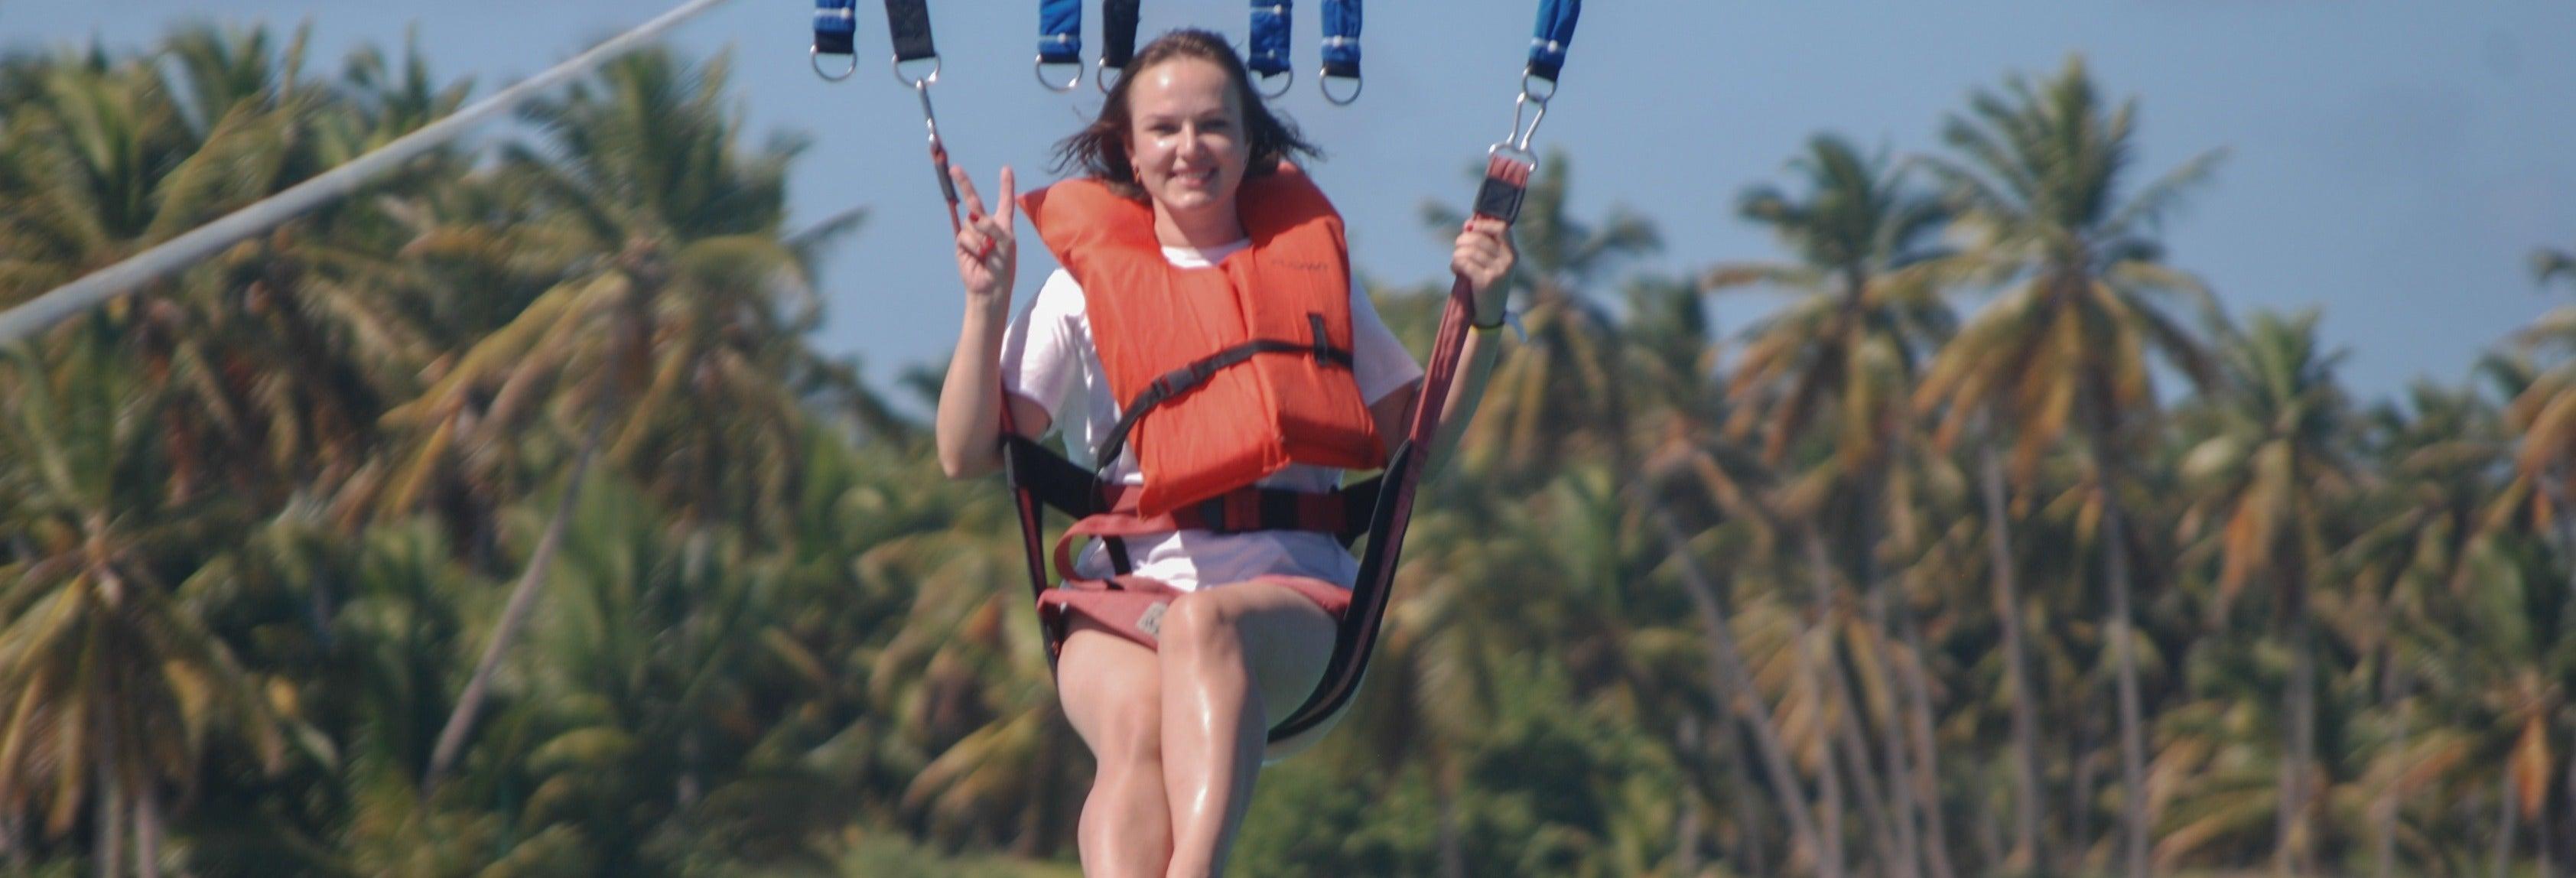 Aventura acuática en Punta Cana